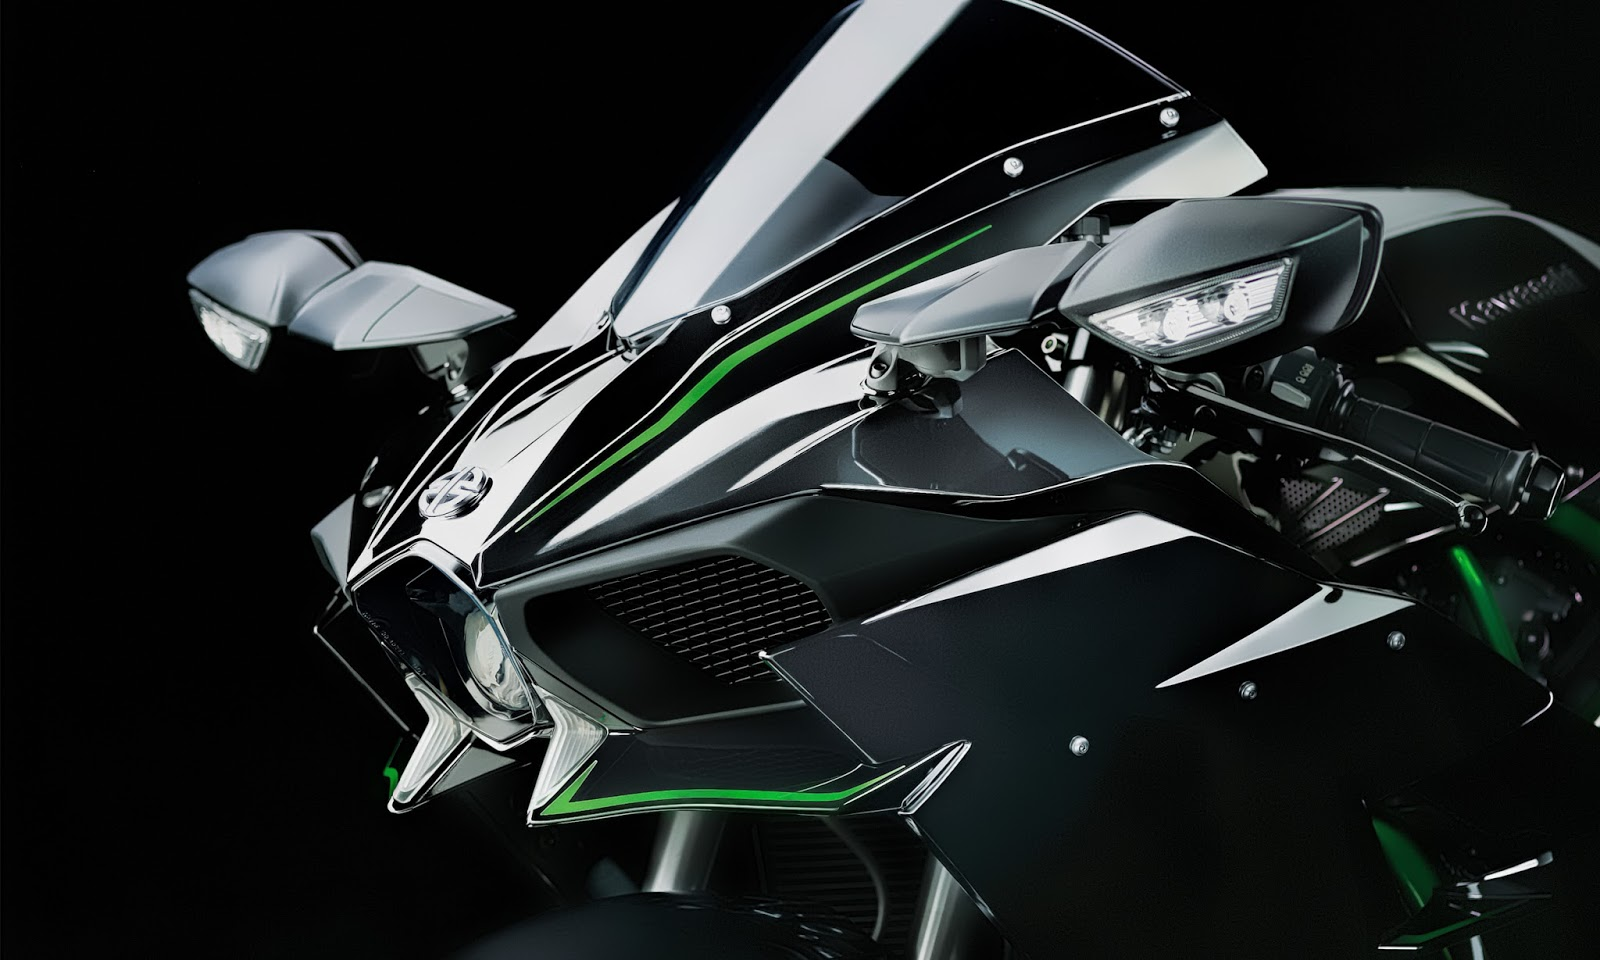 Kawasaki Ninja H2R HD Wallpapers   HD Wallpapers (High Definition ...